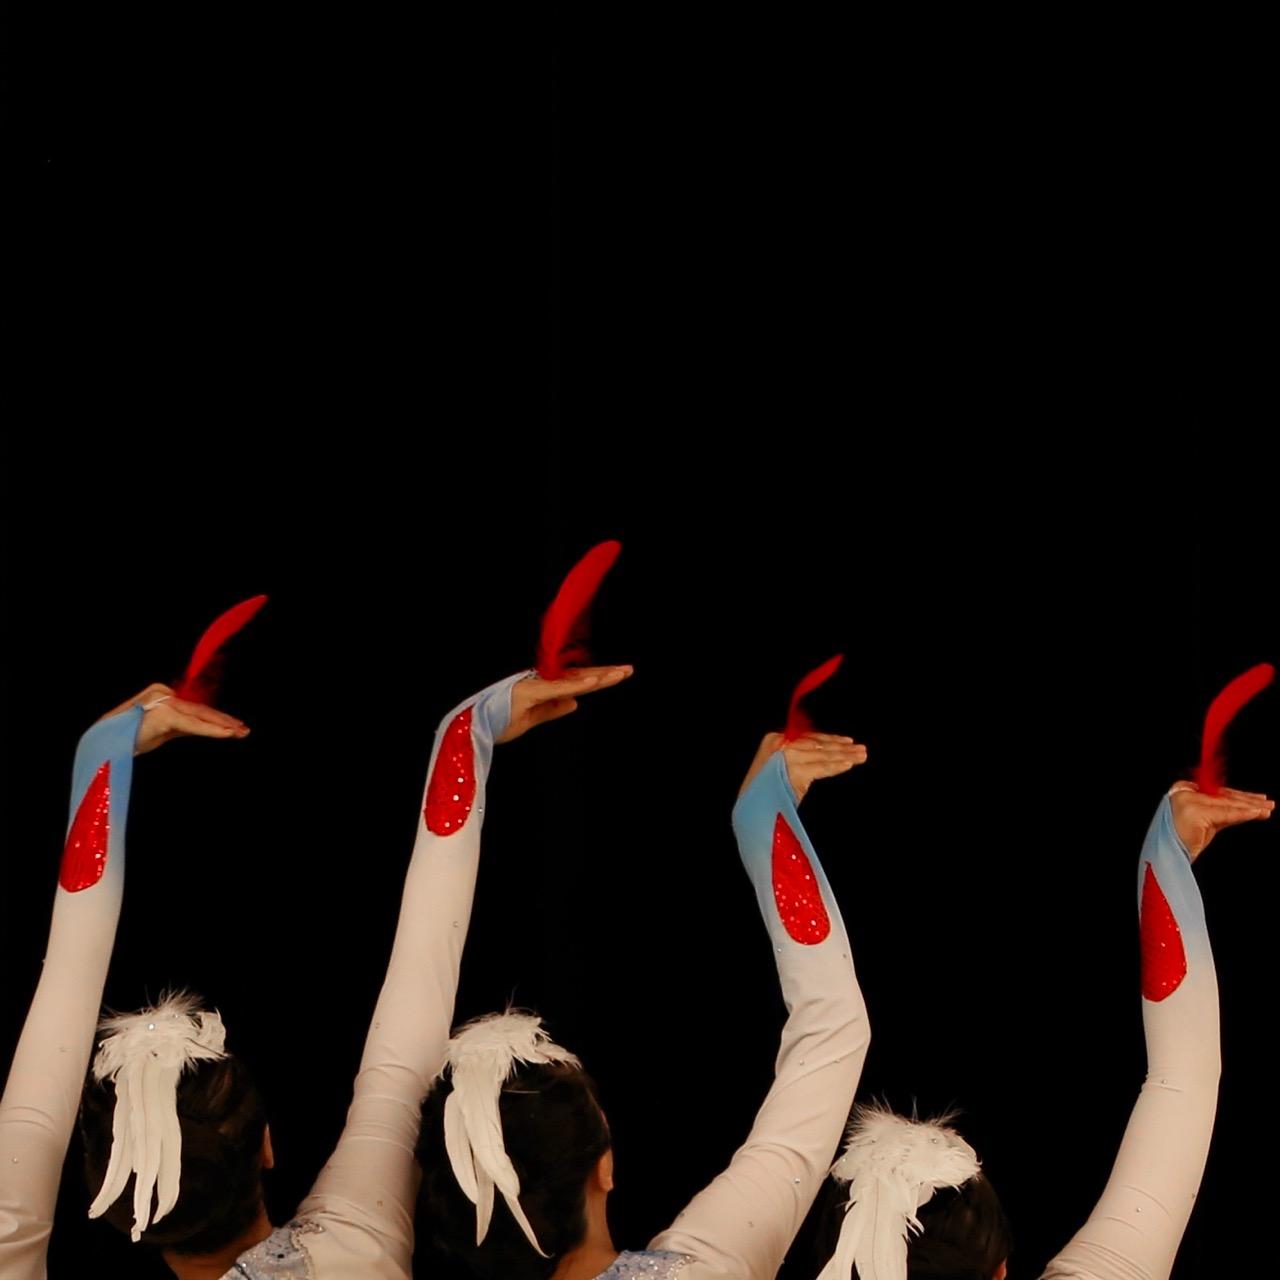 mongolian-swan-migration - 4.jpg